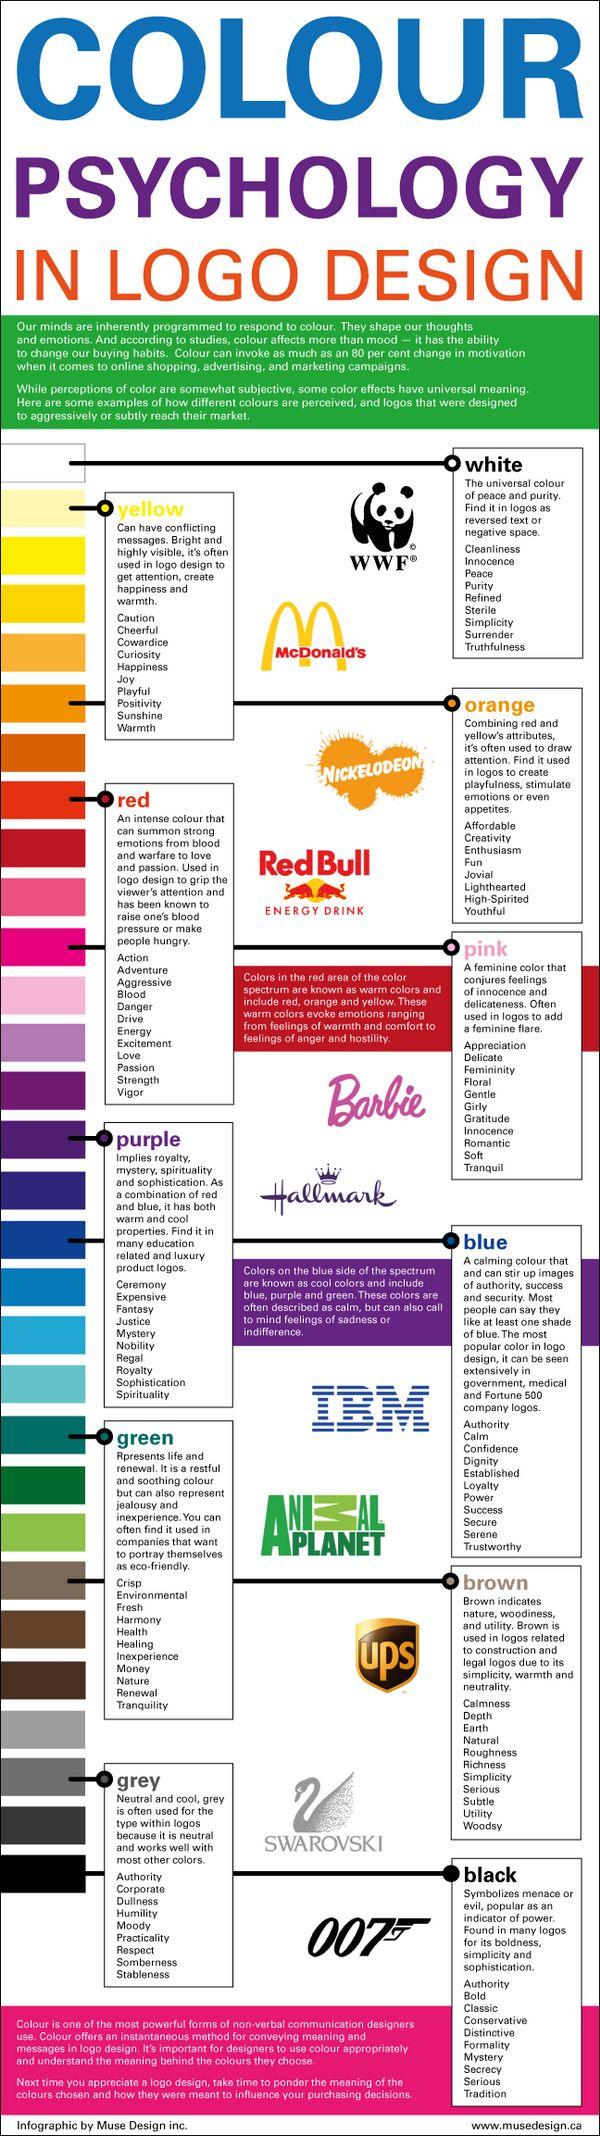 color psychologyLogo Design, Website, Color Psychology, Colours Psychology, Logos Design, Colors Psychology, Graphics Design, Infographic